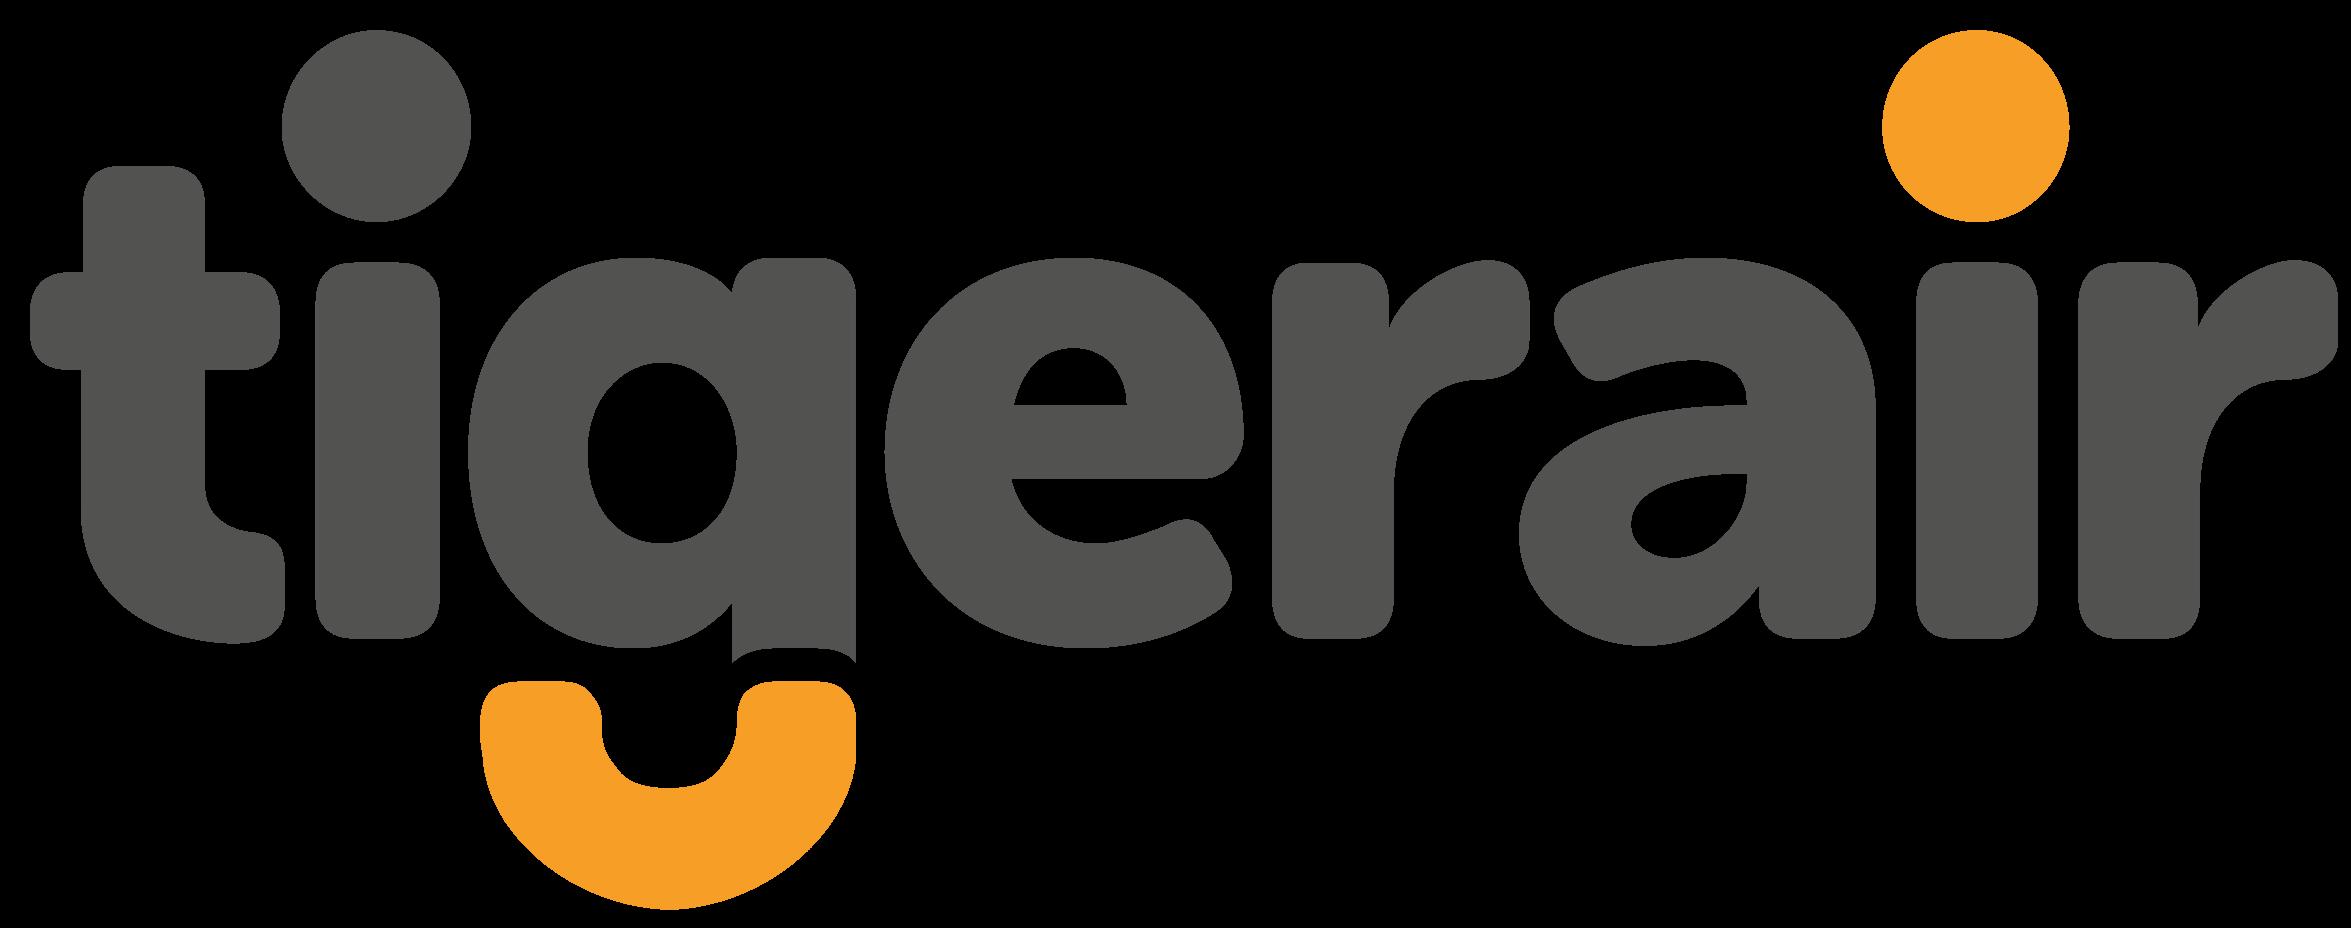 AW-Tigerair_Isologotype